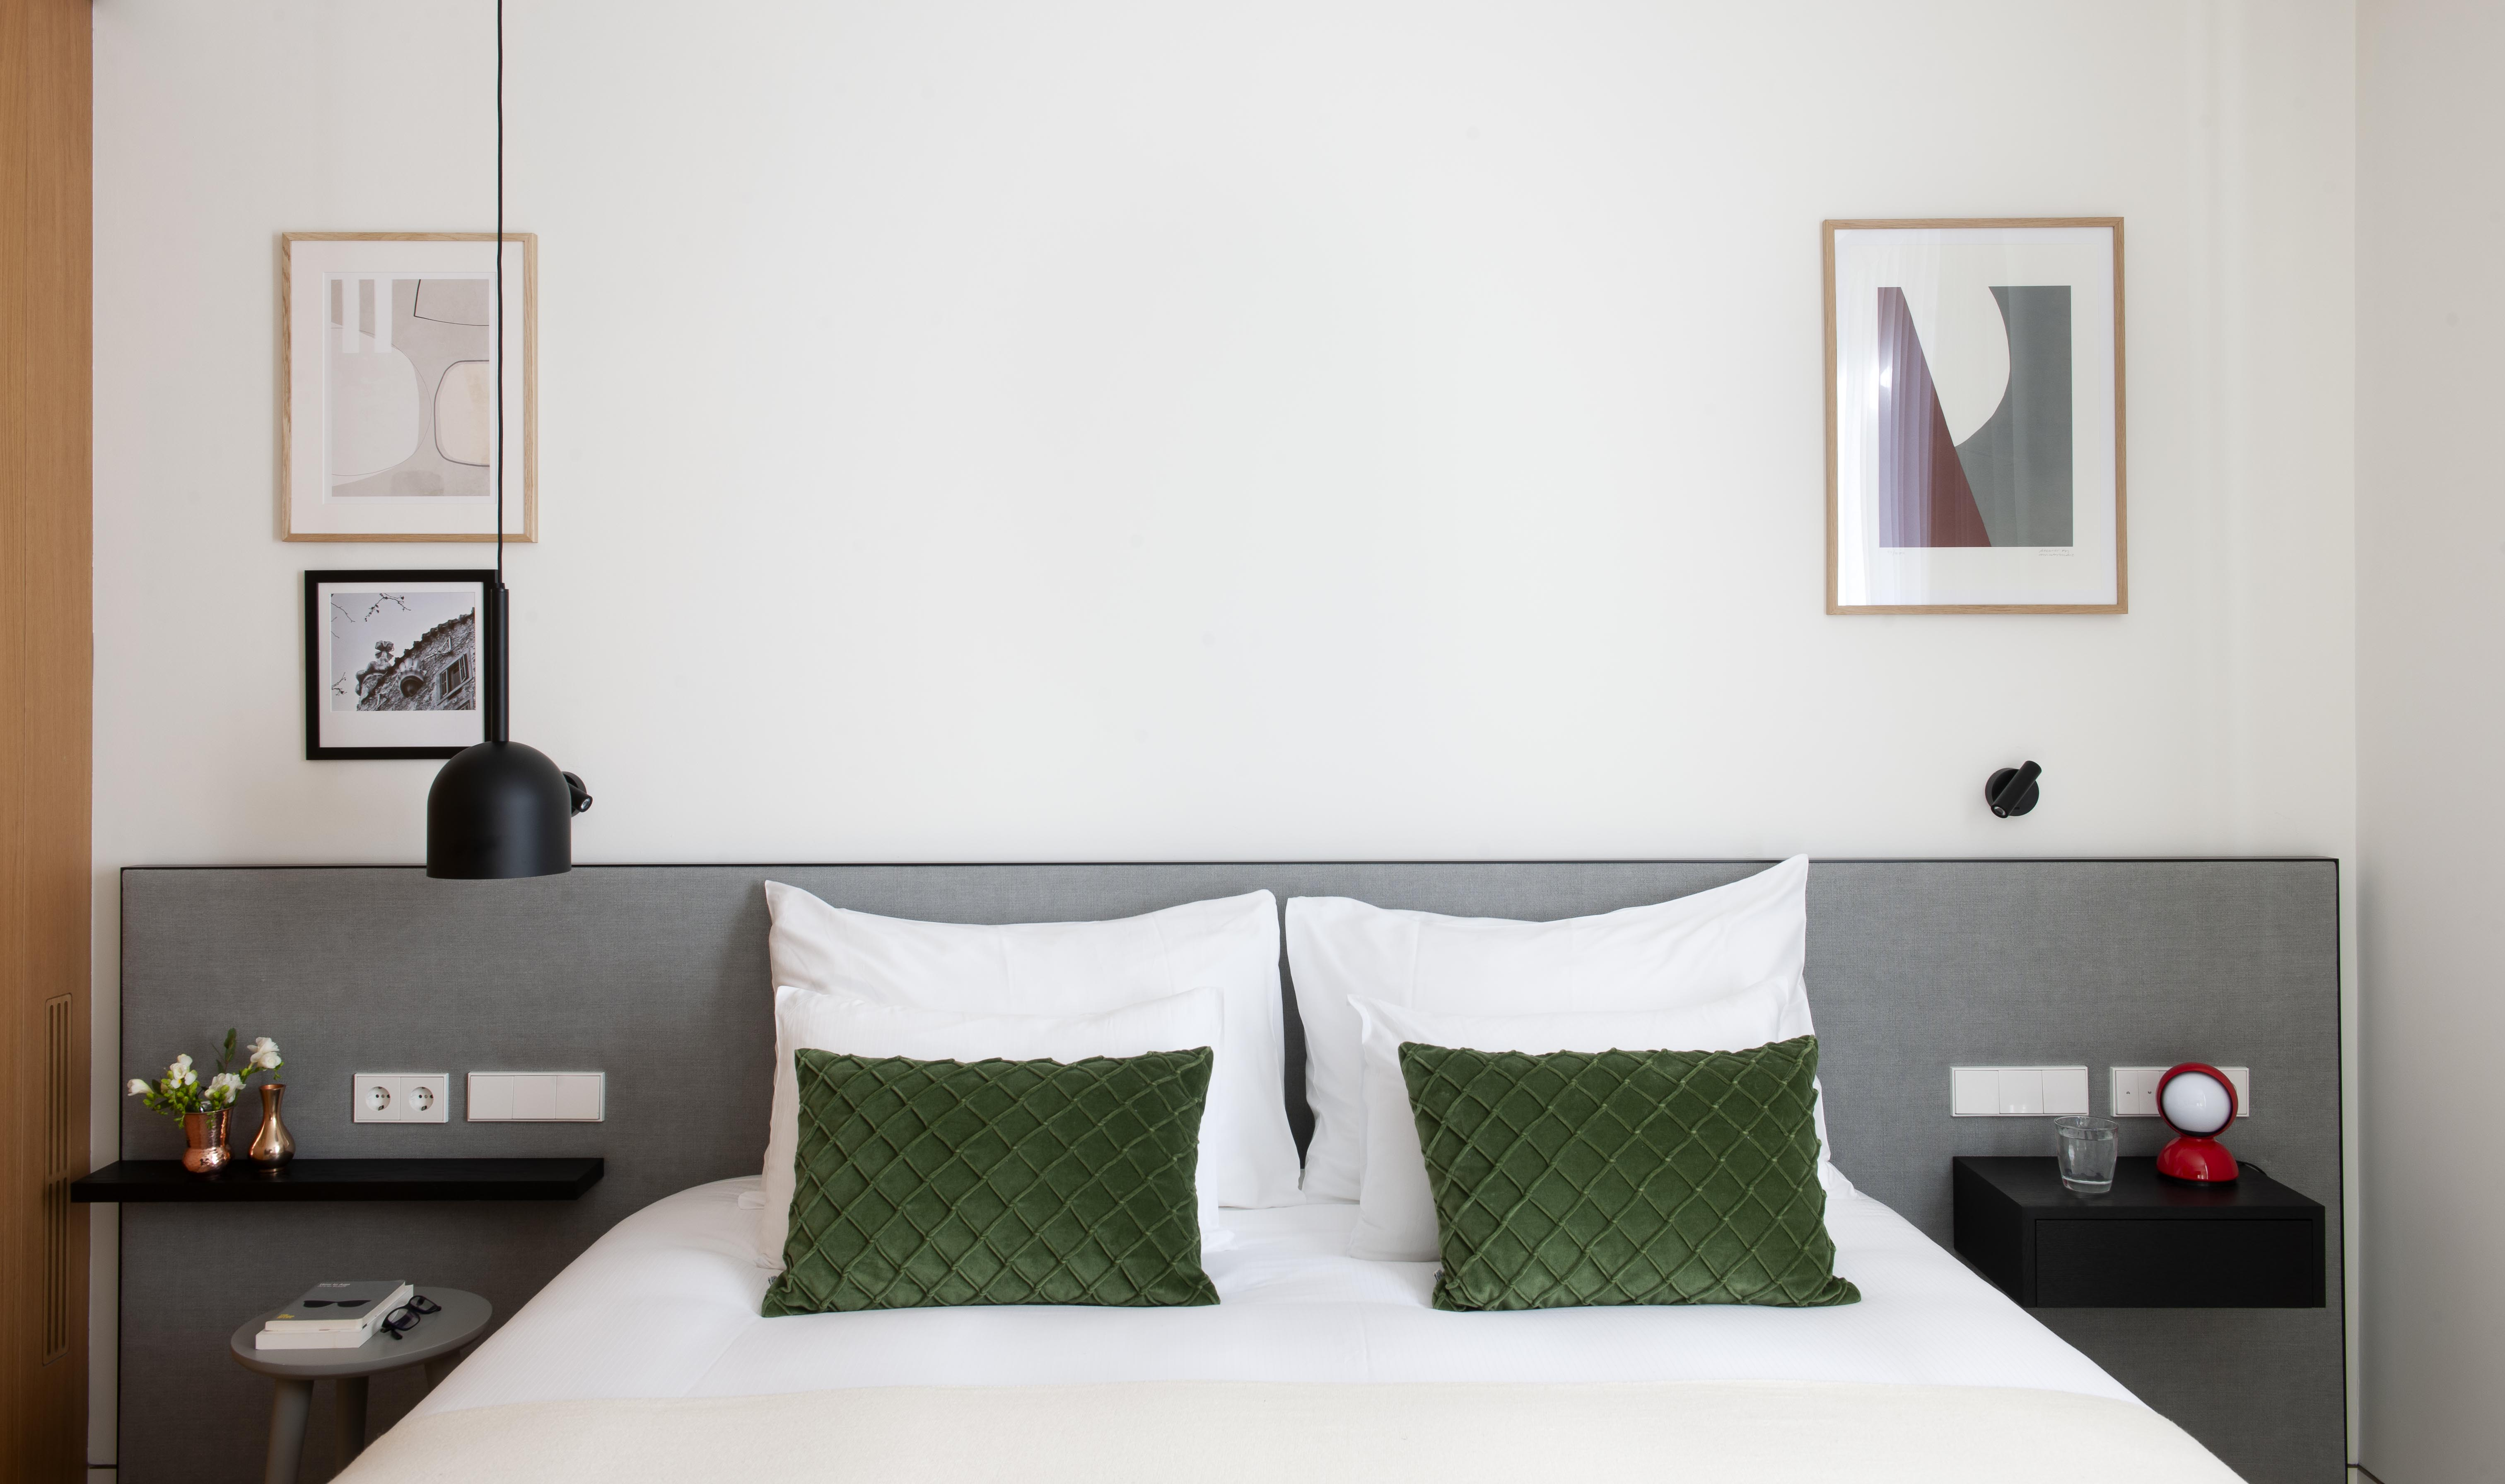 Apartment Luxury Apartment 4 bedrooms 4  1   photo 23315959